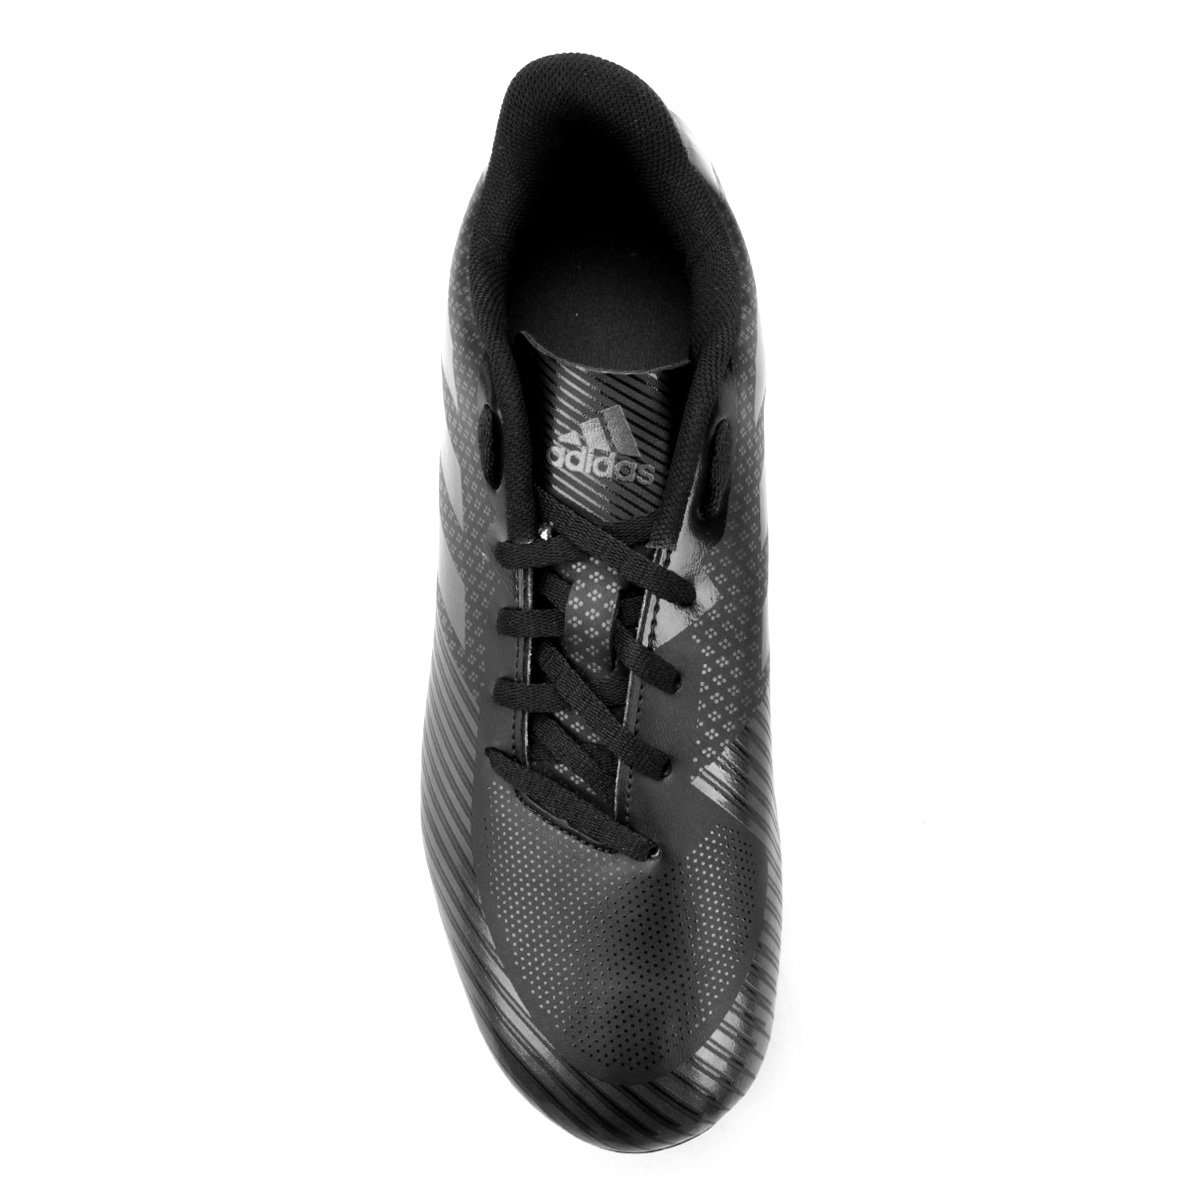 Chuteira Campo Adidas Artilheira 18 FXG - Preto - Compre Agora ... ea117cbe04e5a